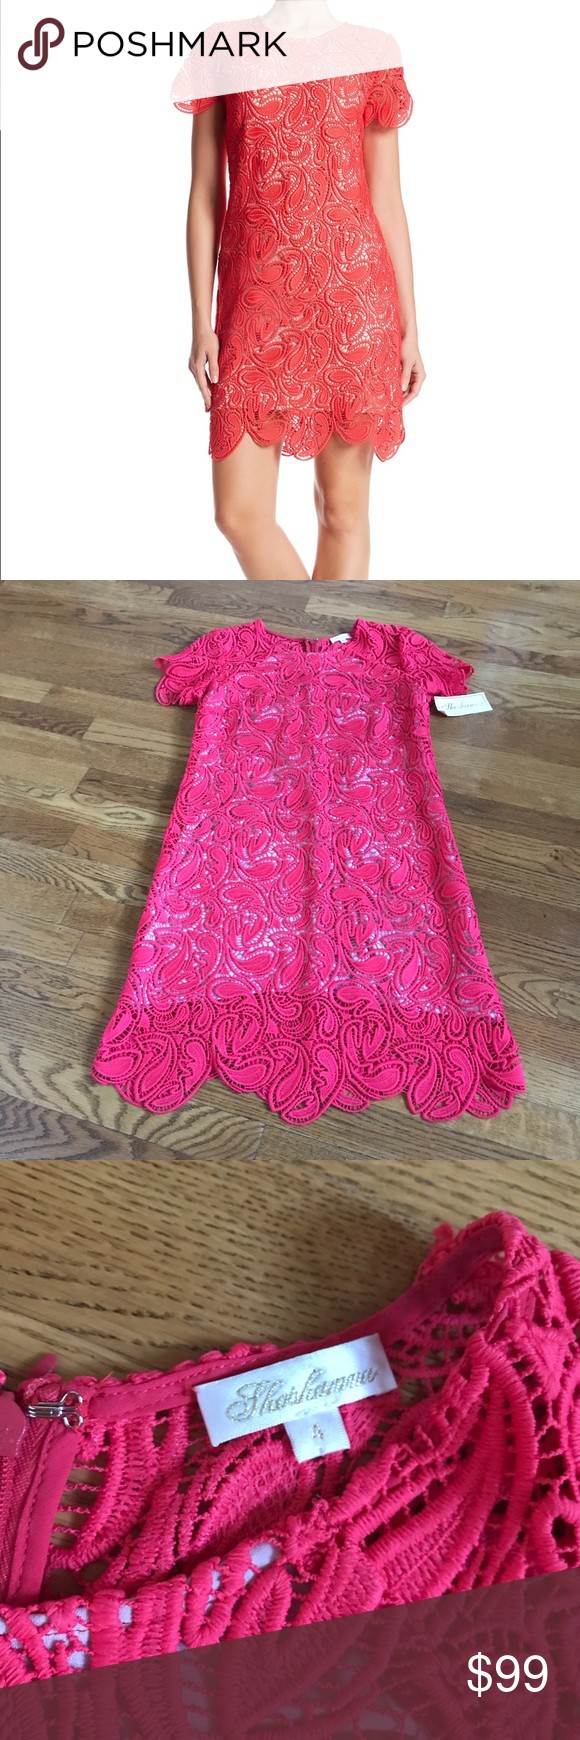 Shoshanna rae crochet dress pink size nwt scalloped hem zip and